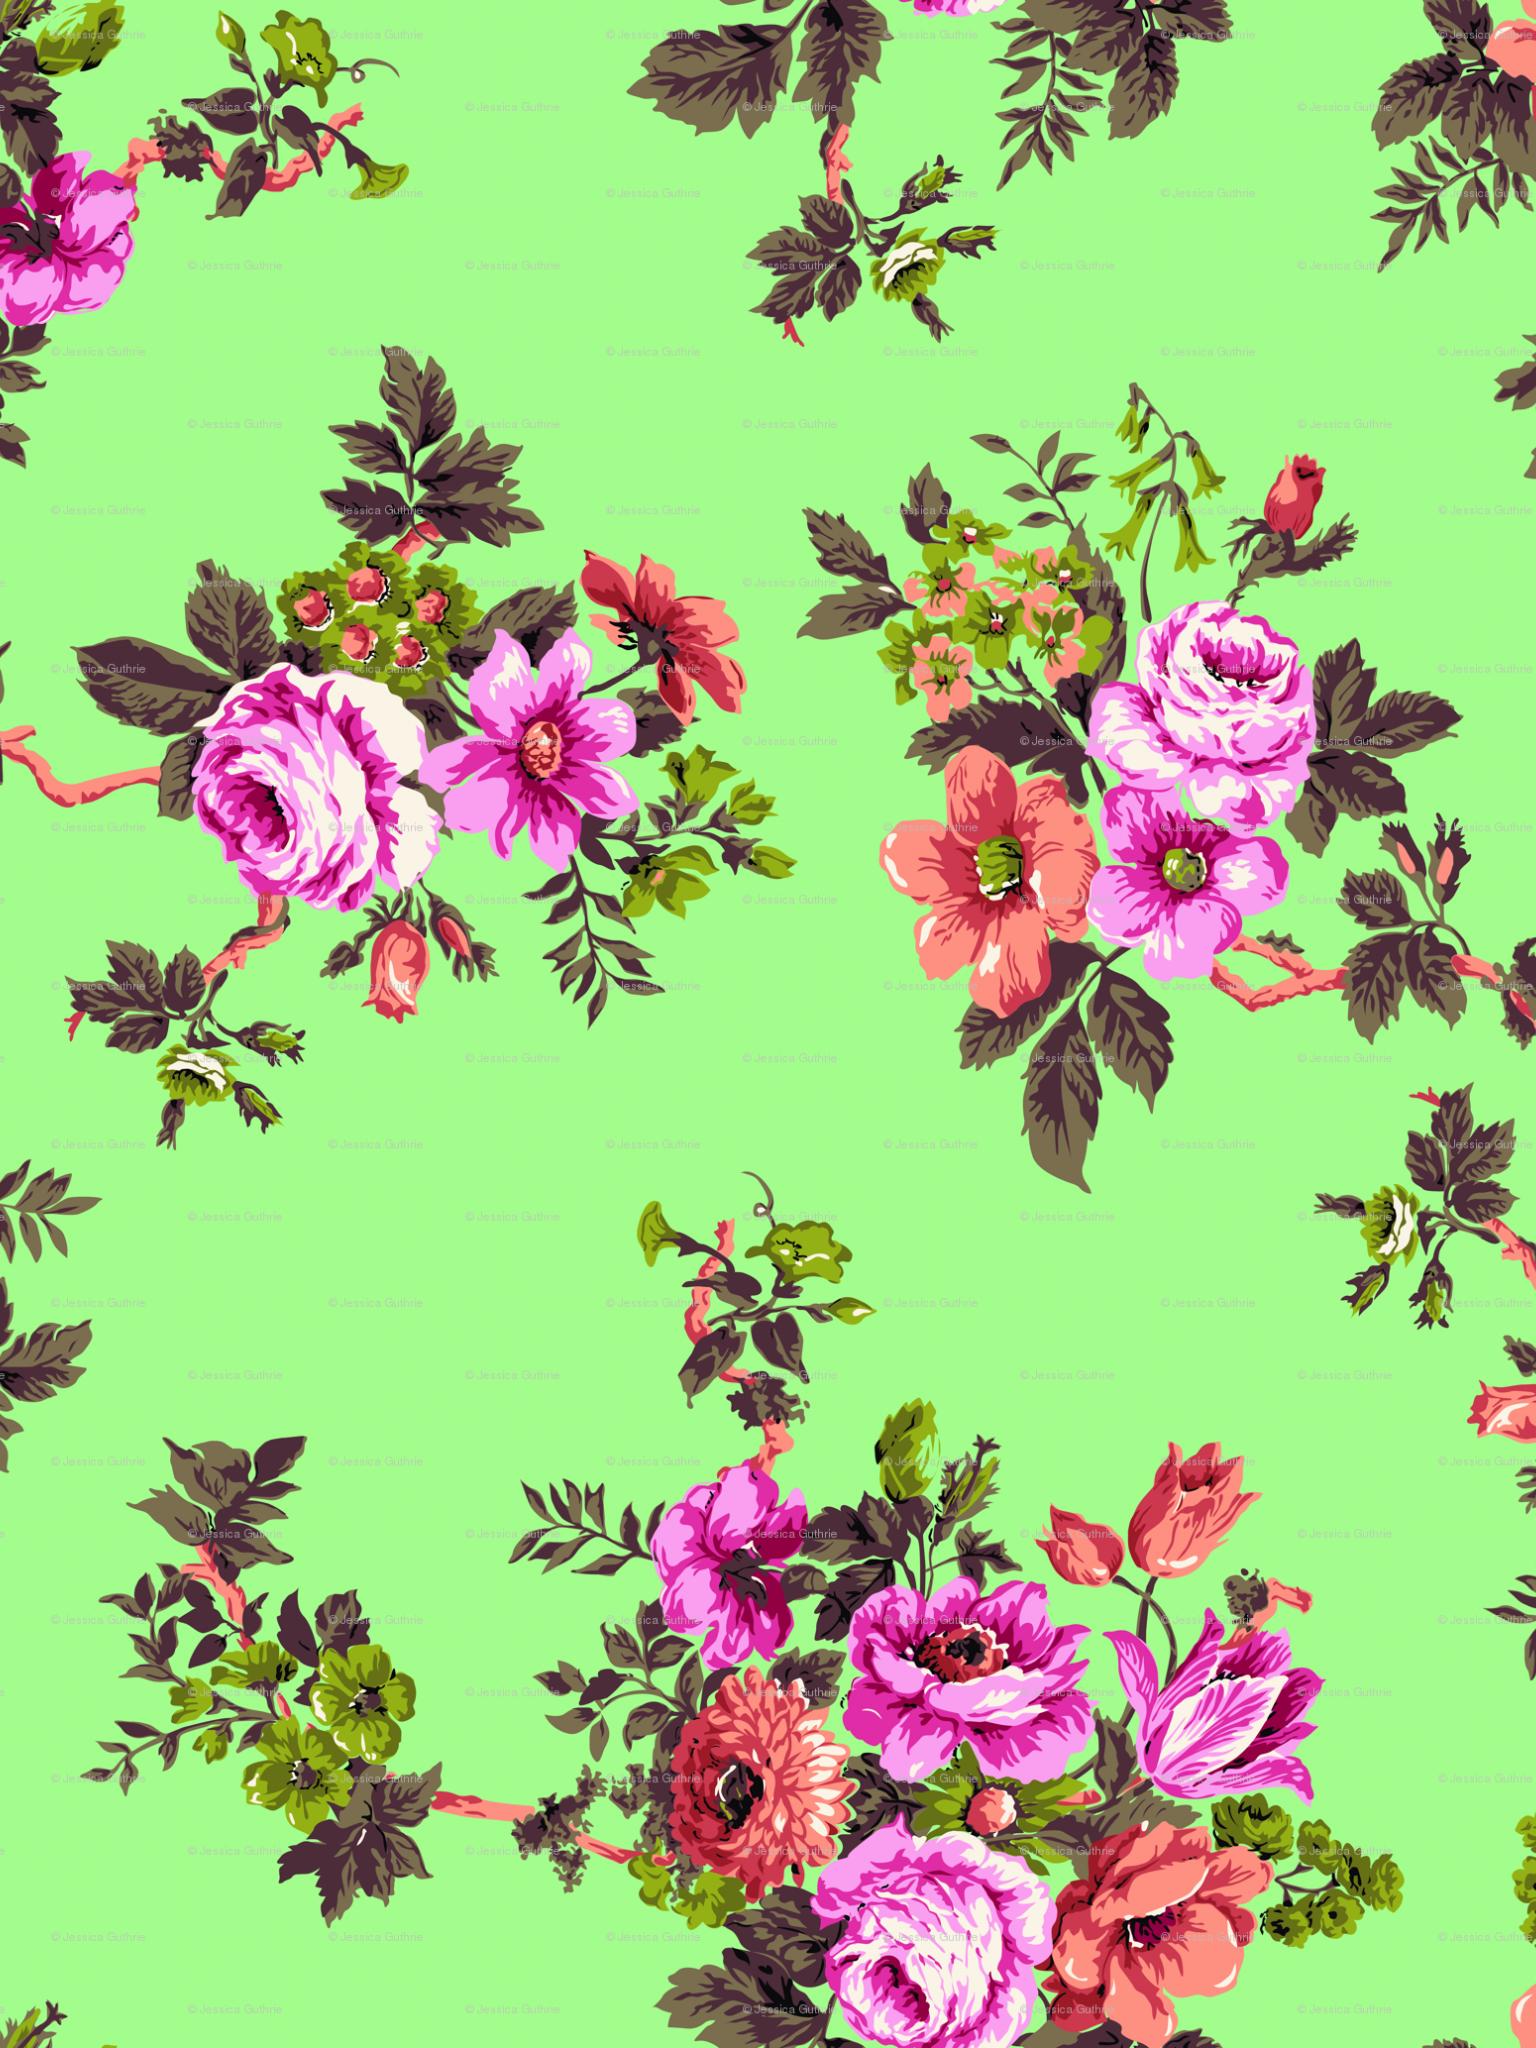 Free Download Vintage Flower Wallpaper For Iphone Japanese Floral